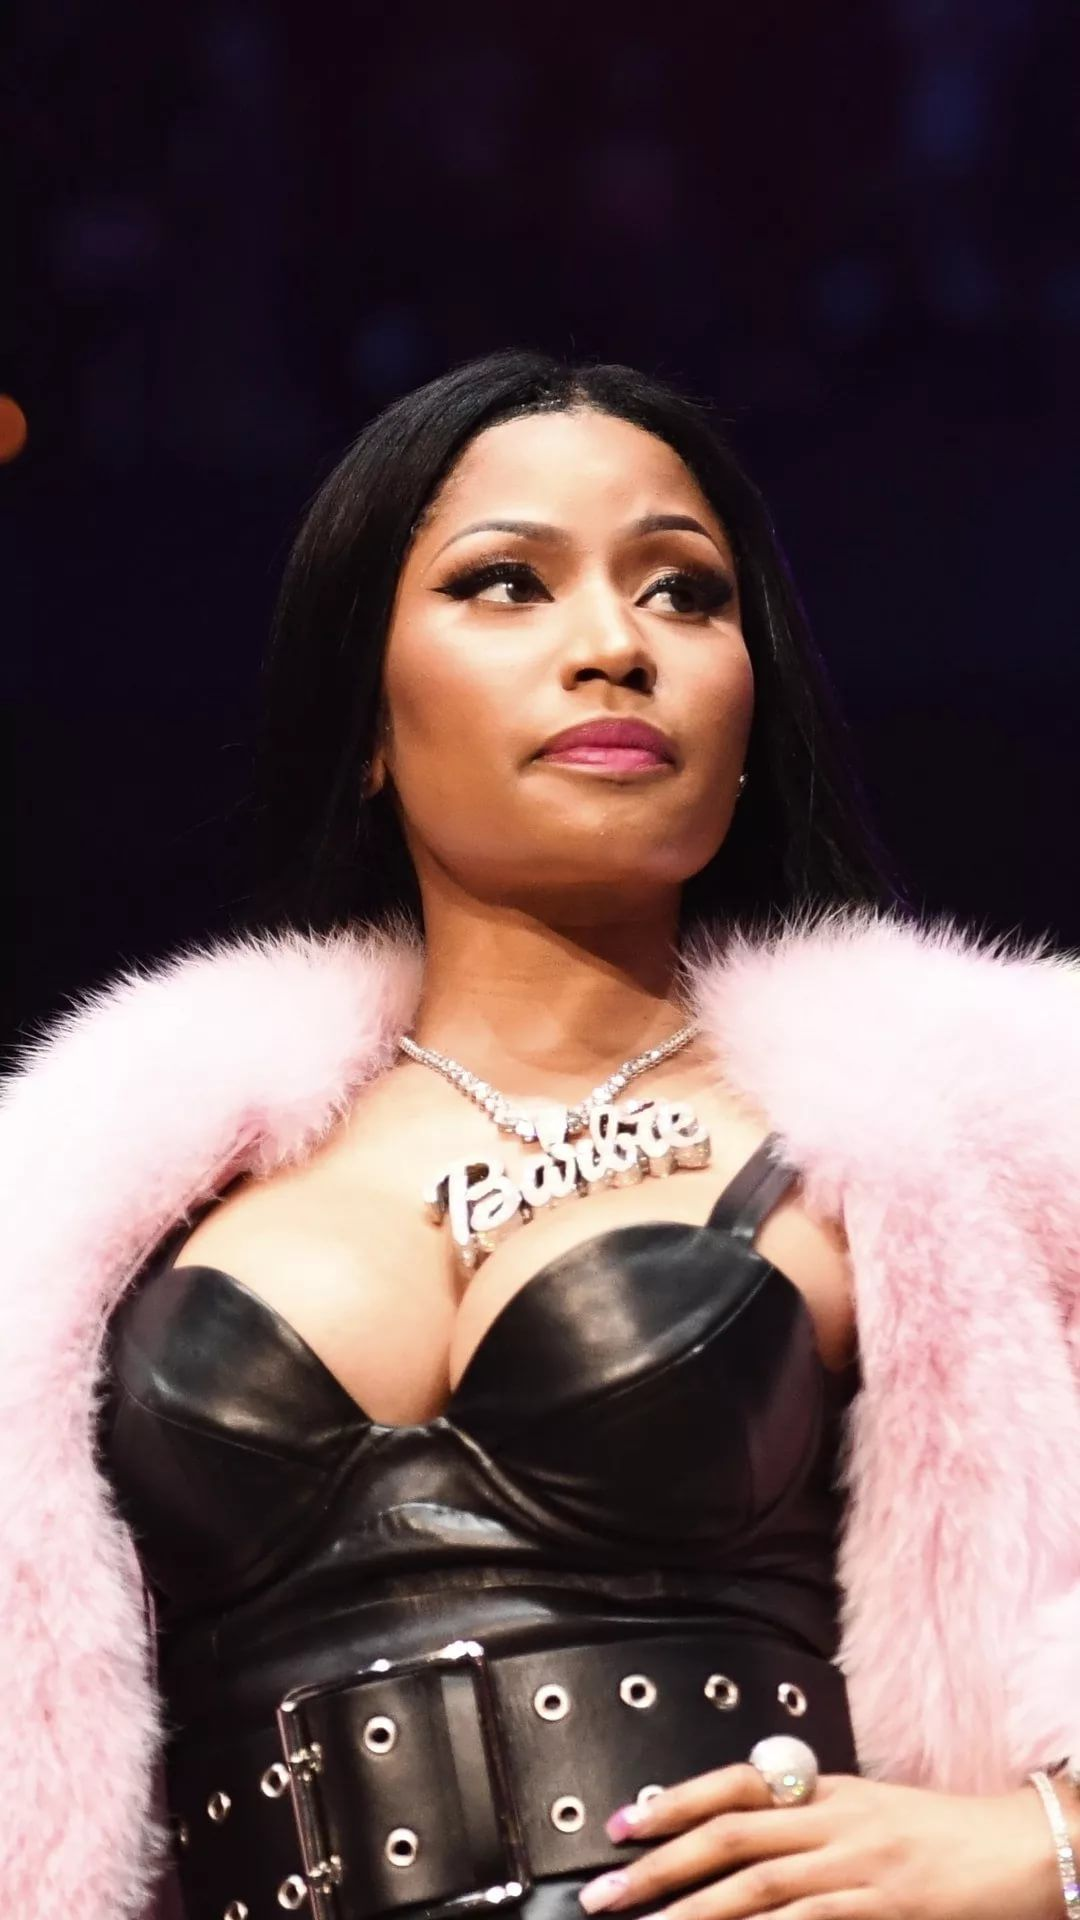 Nicki Minaj Anaconda wallpaper for iPhone